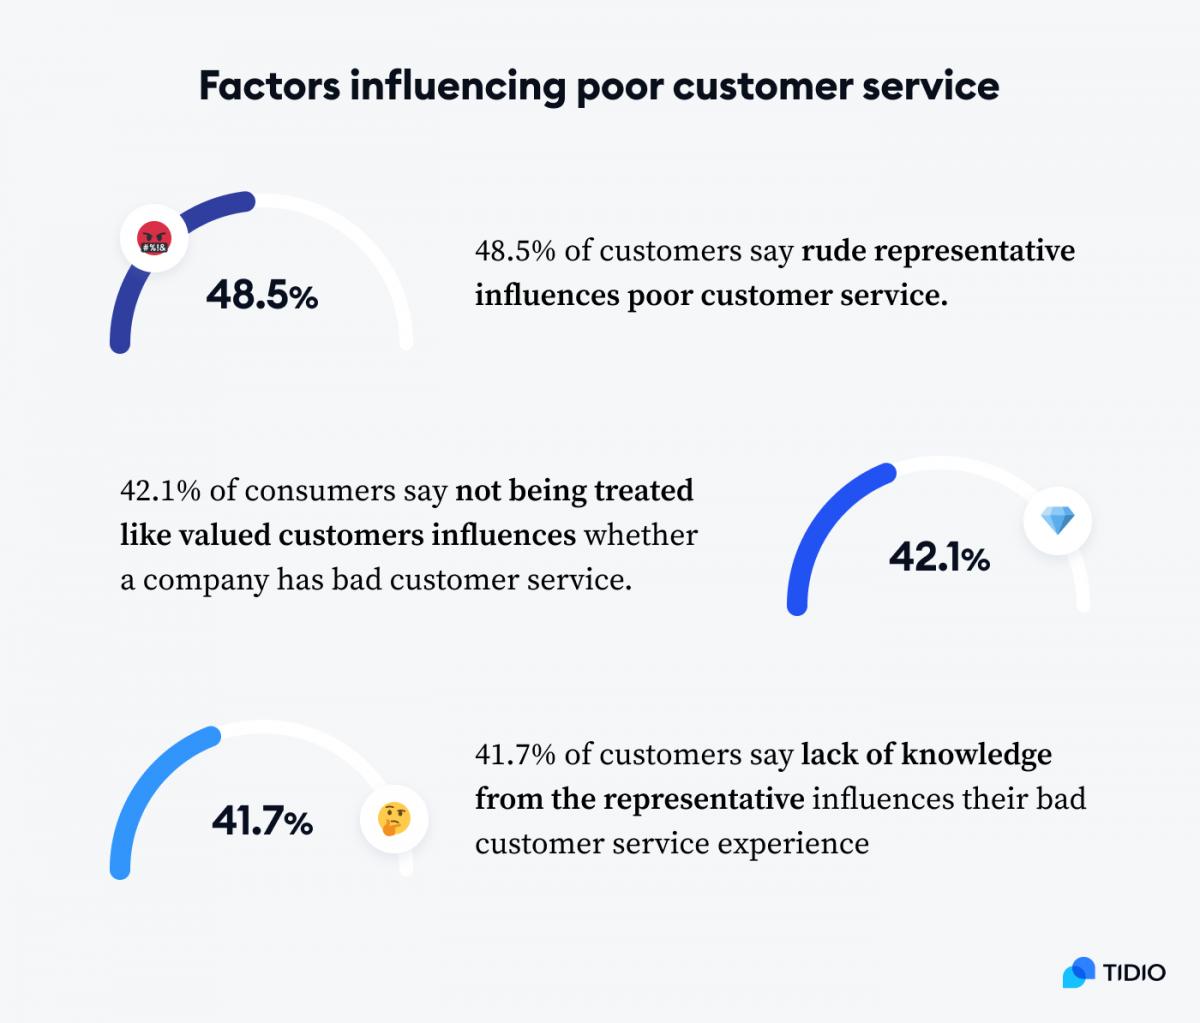 Infographic with three statistics - factors influencing poor customer service